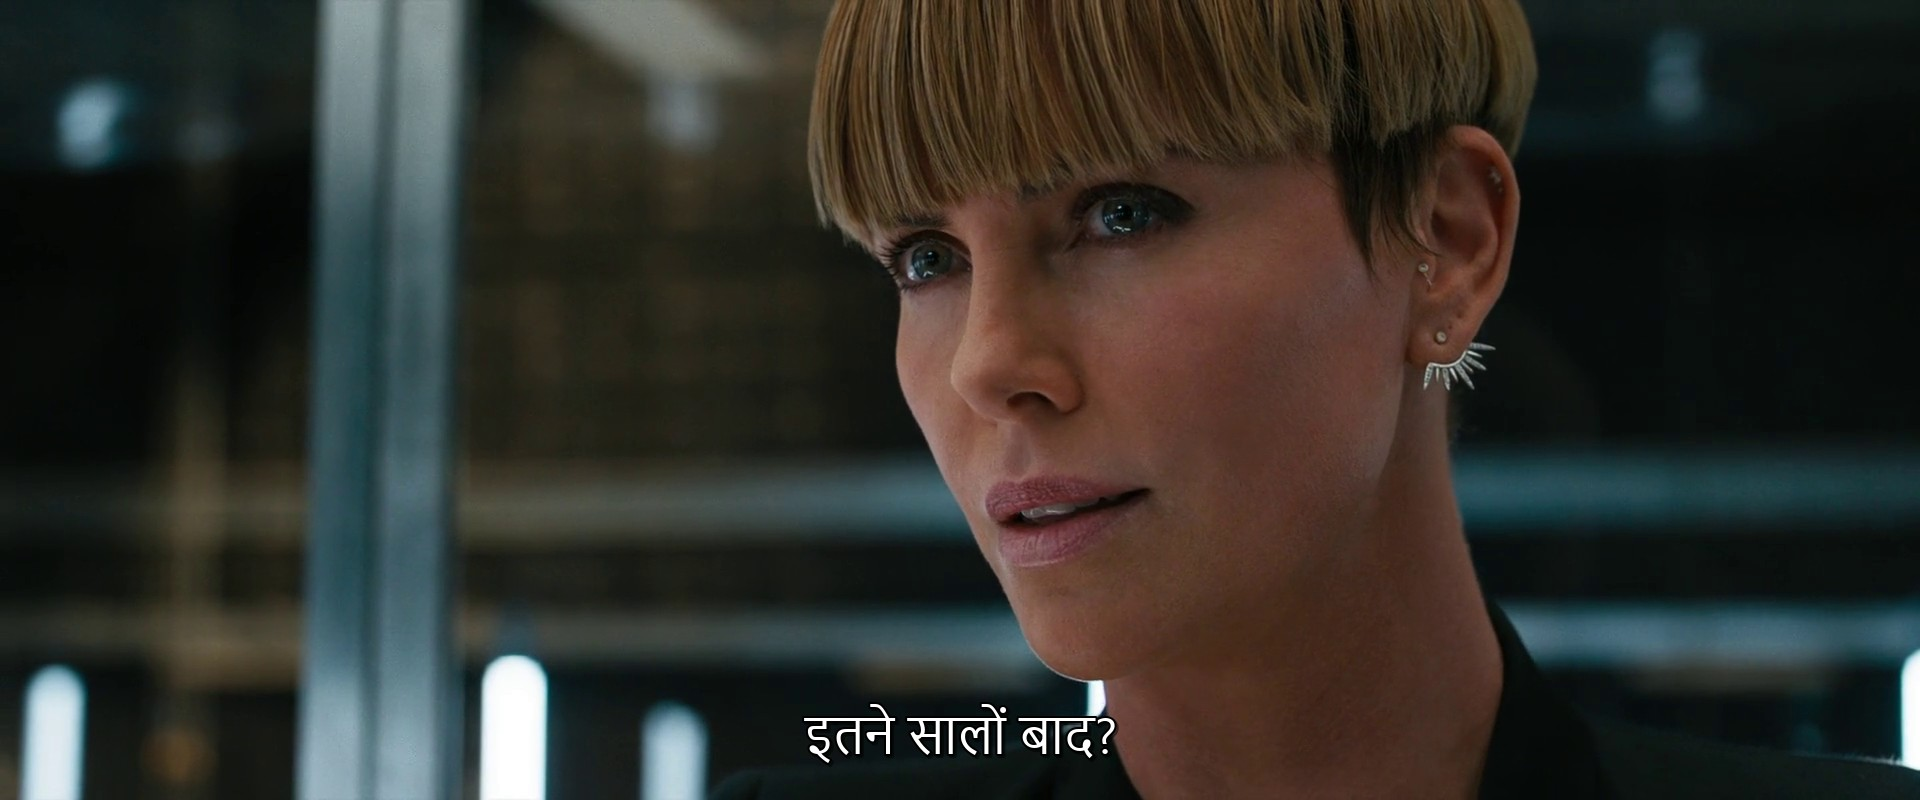 Download Fast And Furious 9 Hindi